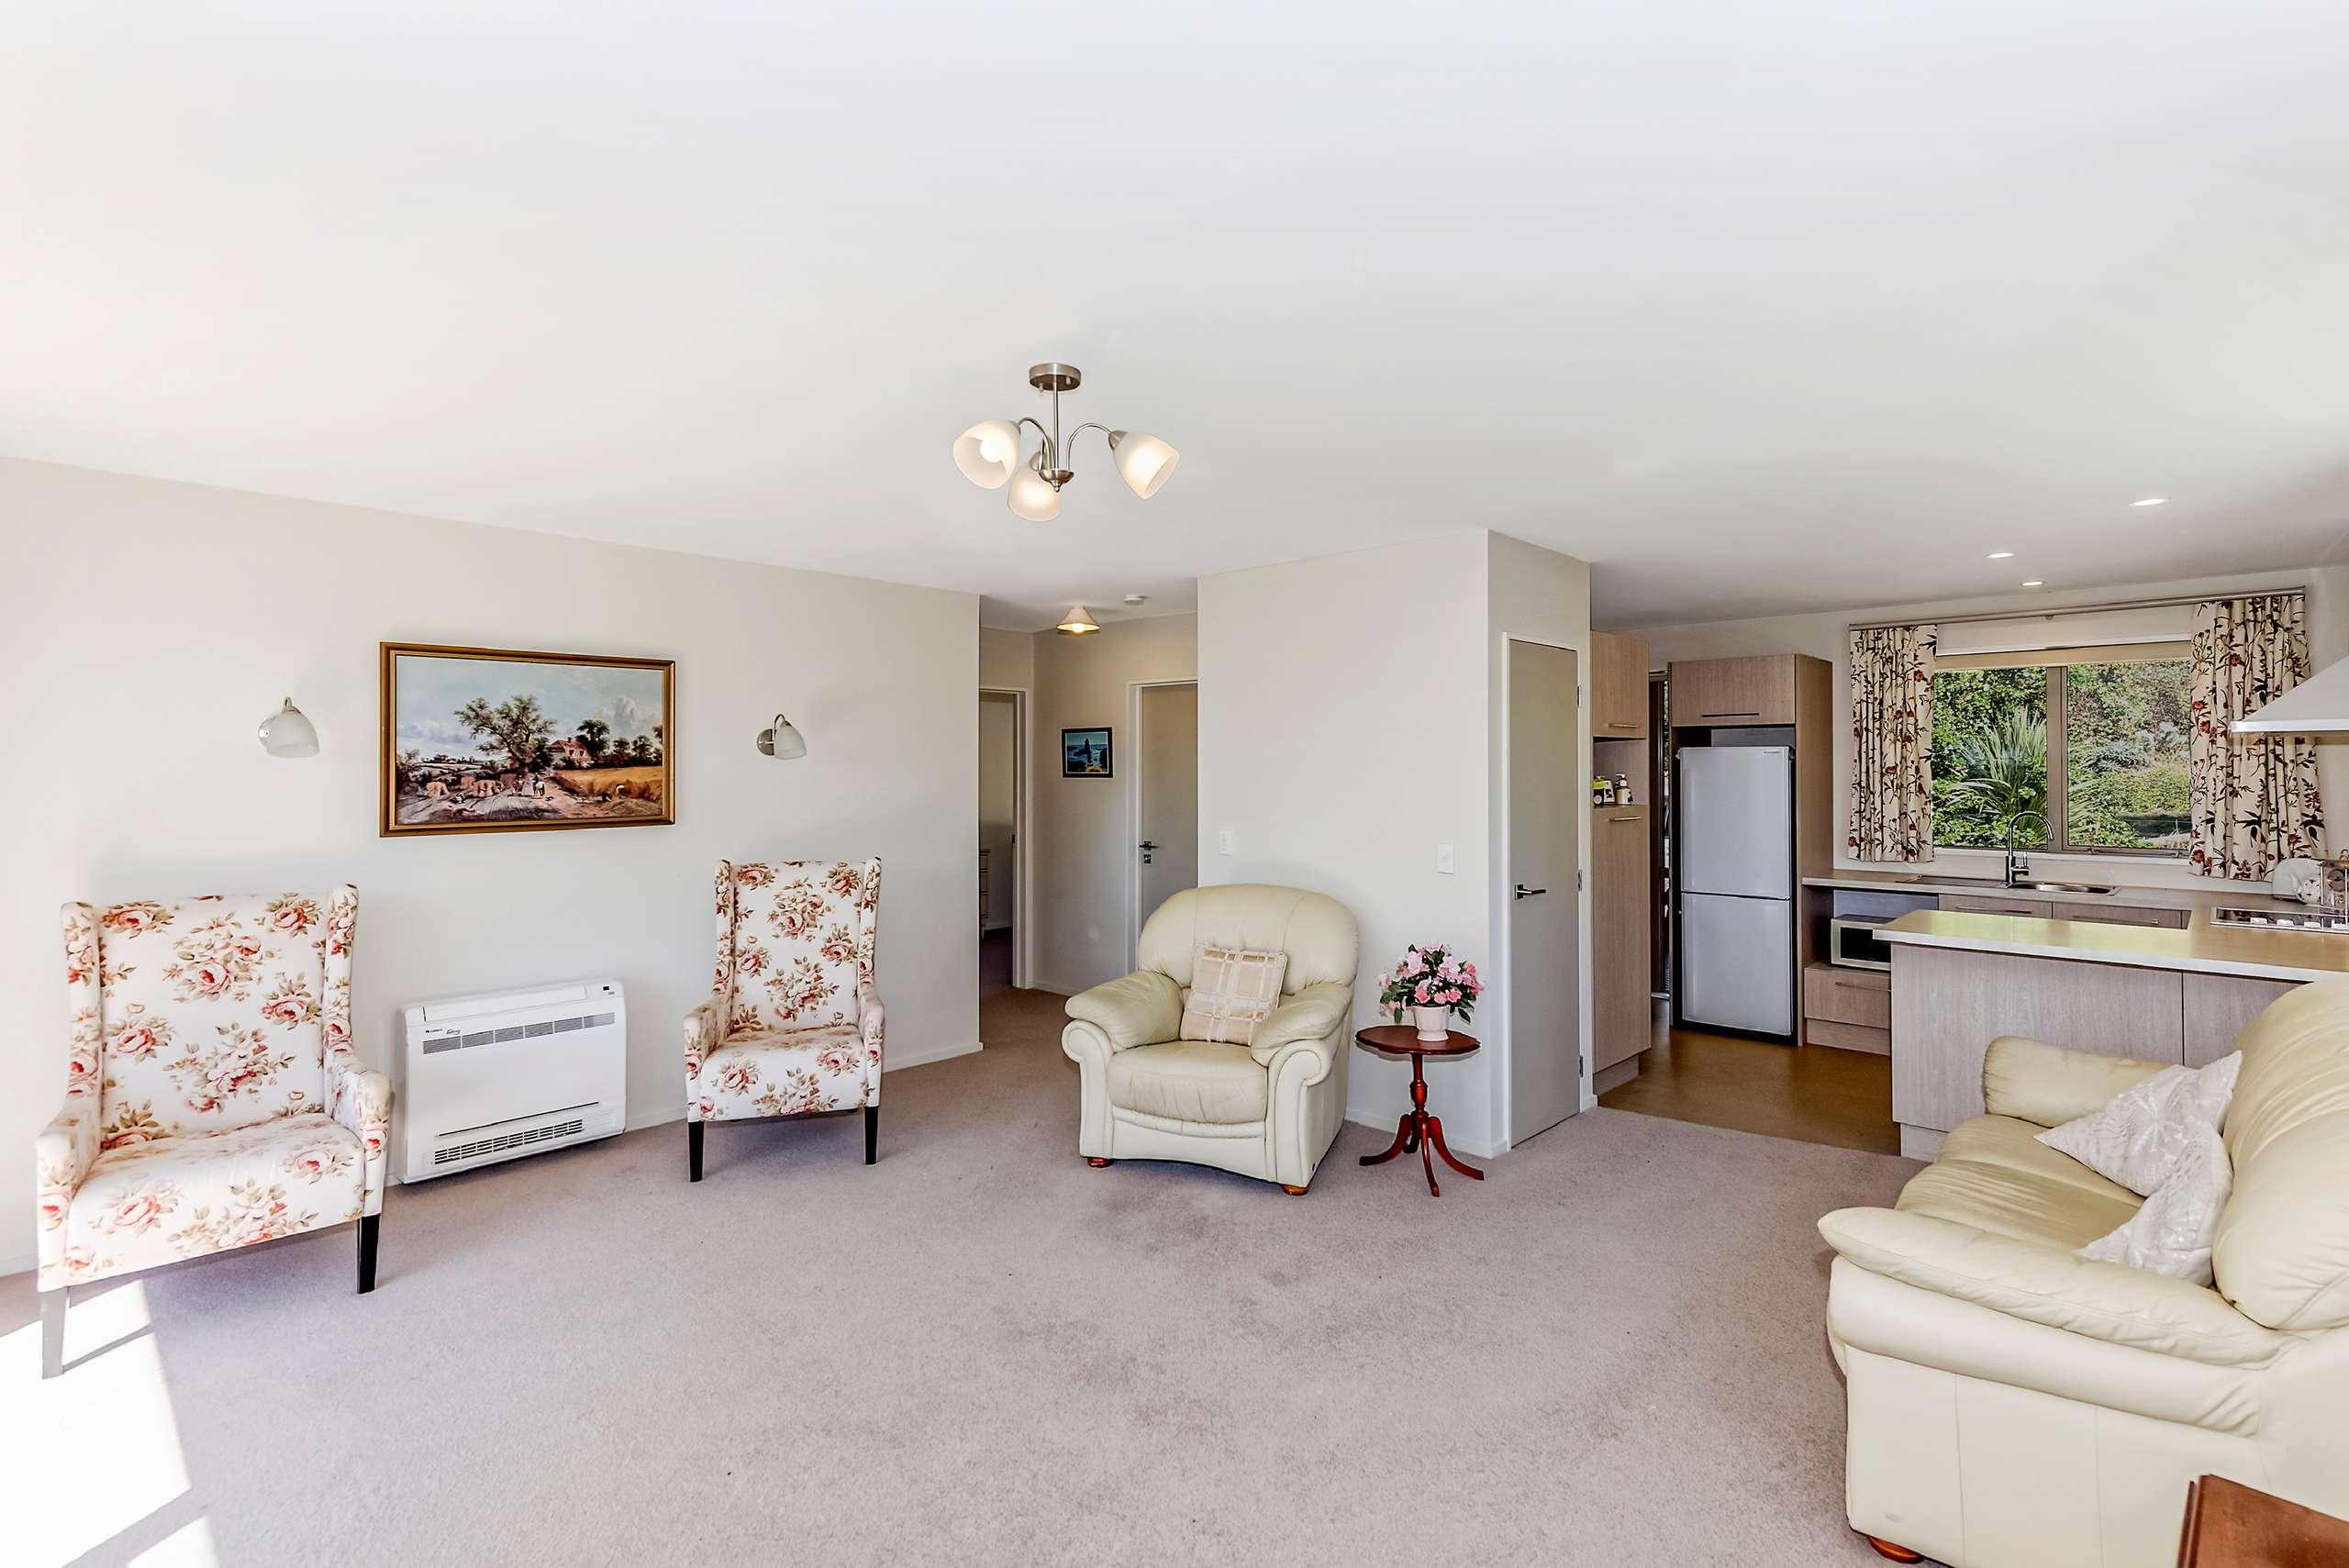 2/22a McCormacks Bay Road, Mount Pleasant, Christchurch City 8081